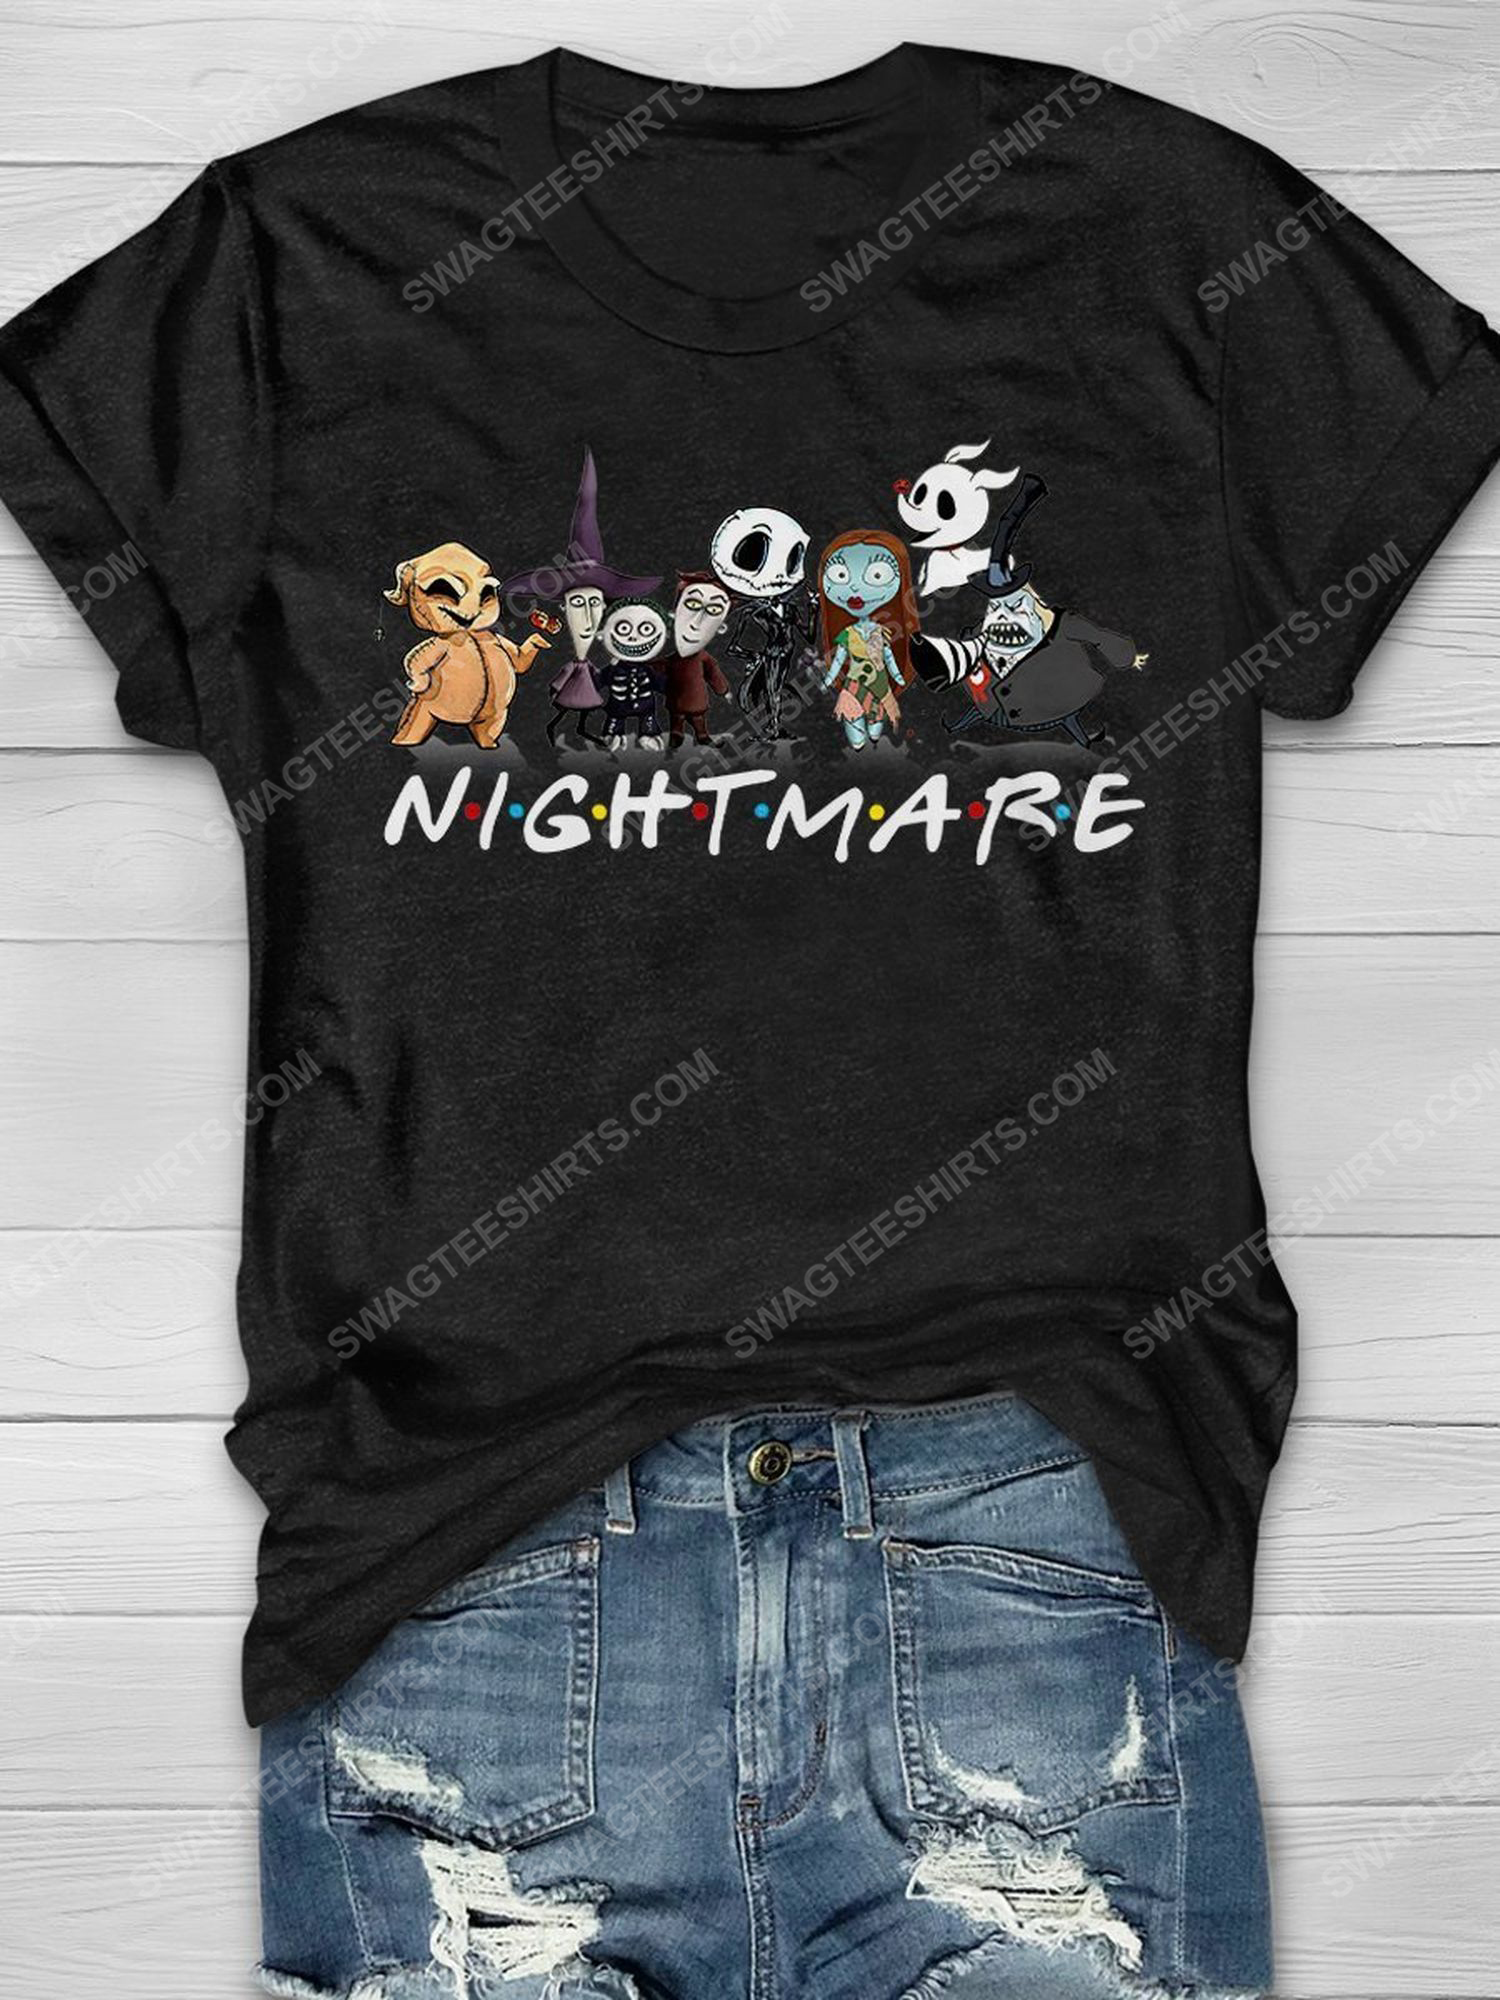 Halloween the nightmare before christmas chibi friends tv show shirt 1 - Copy (2)